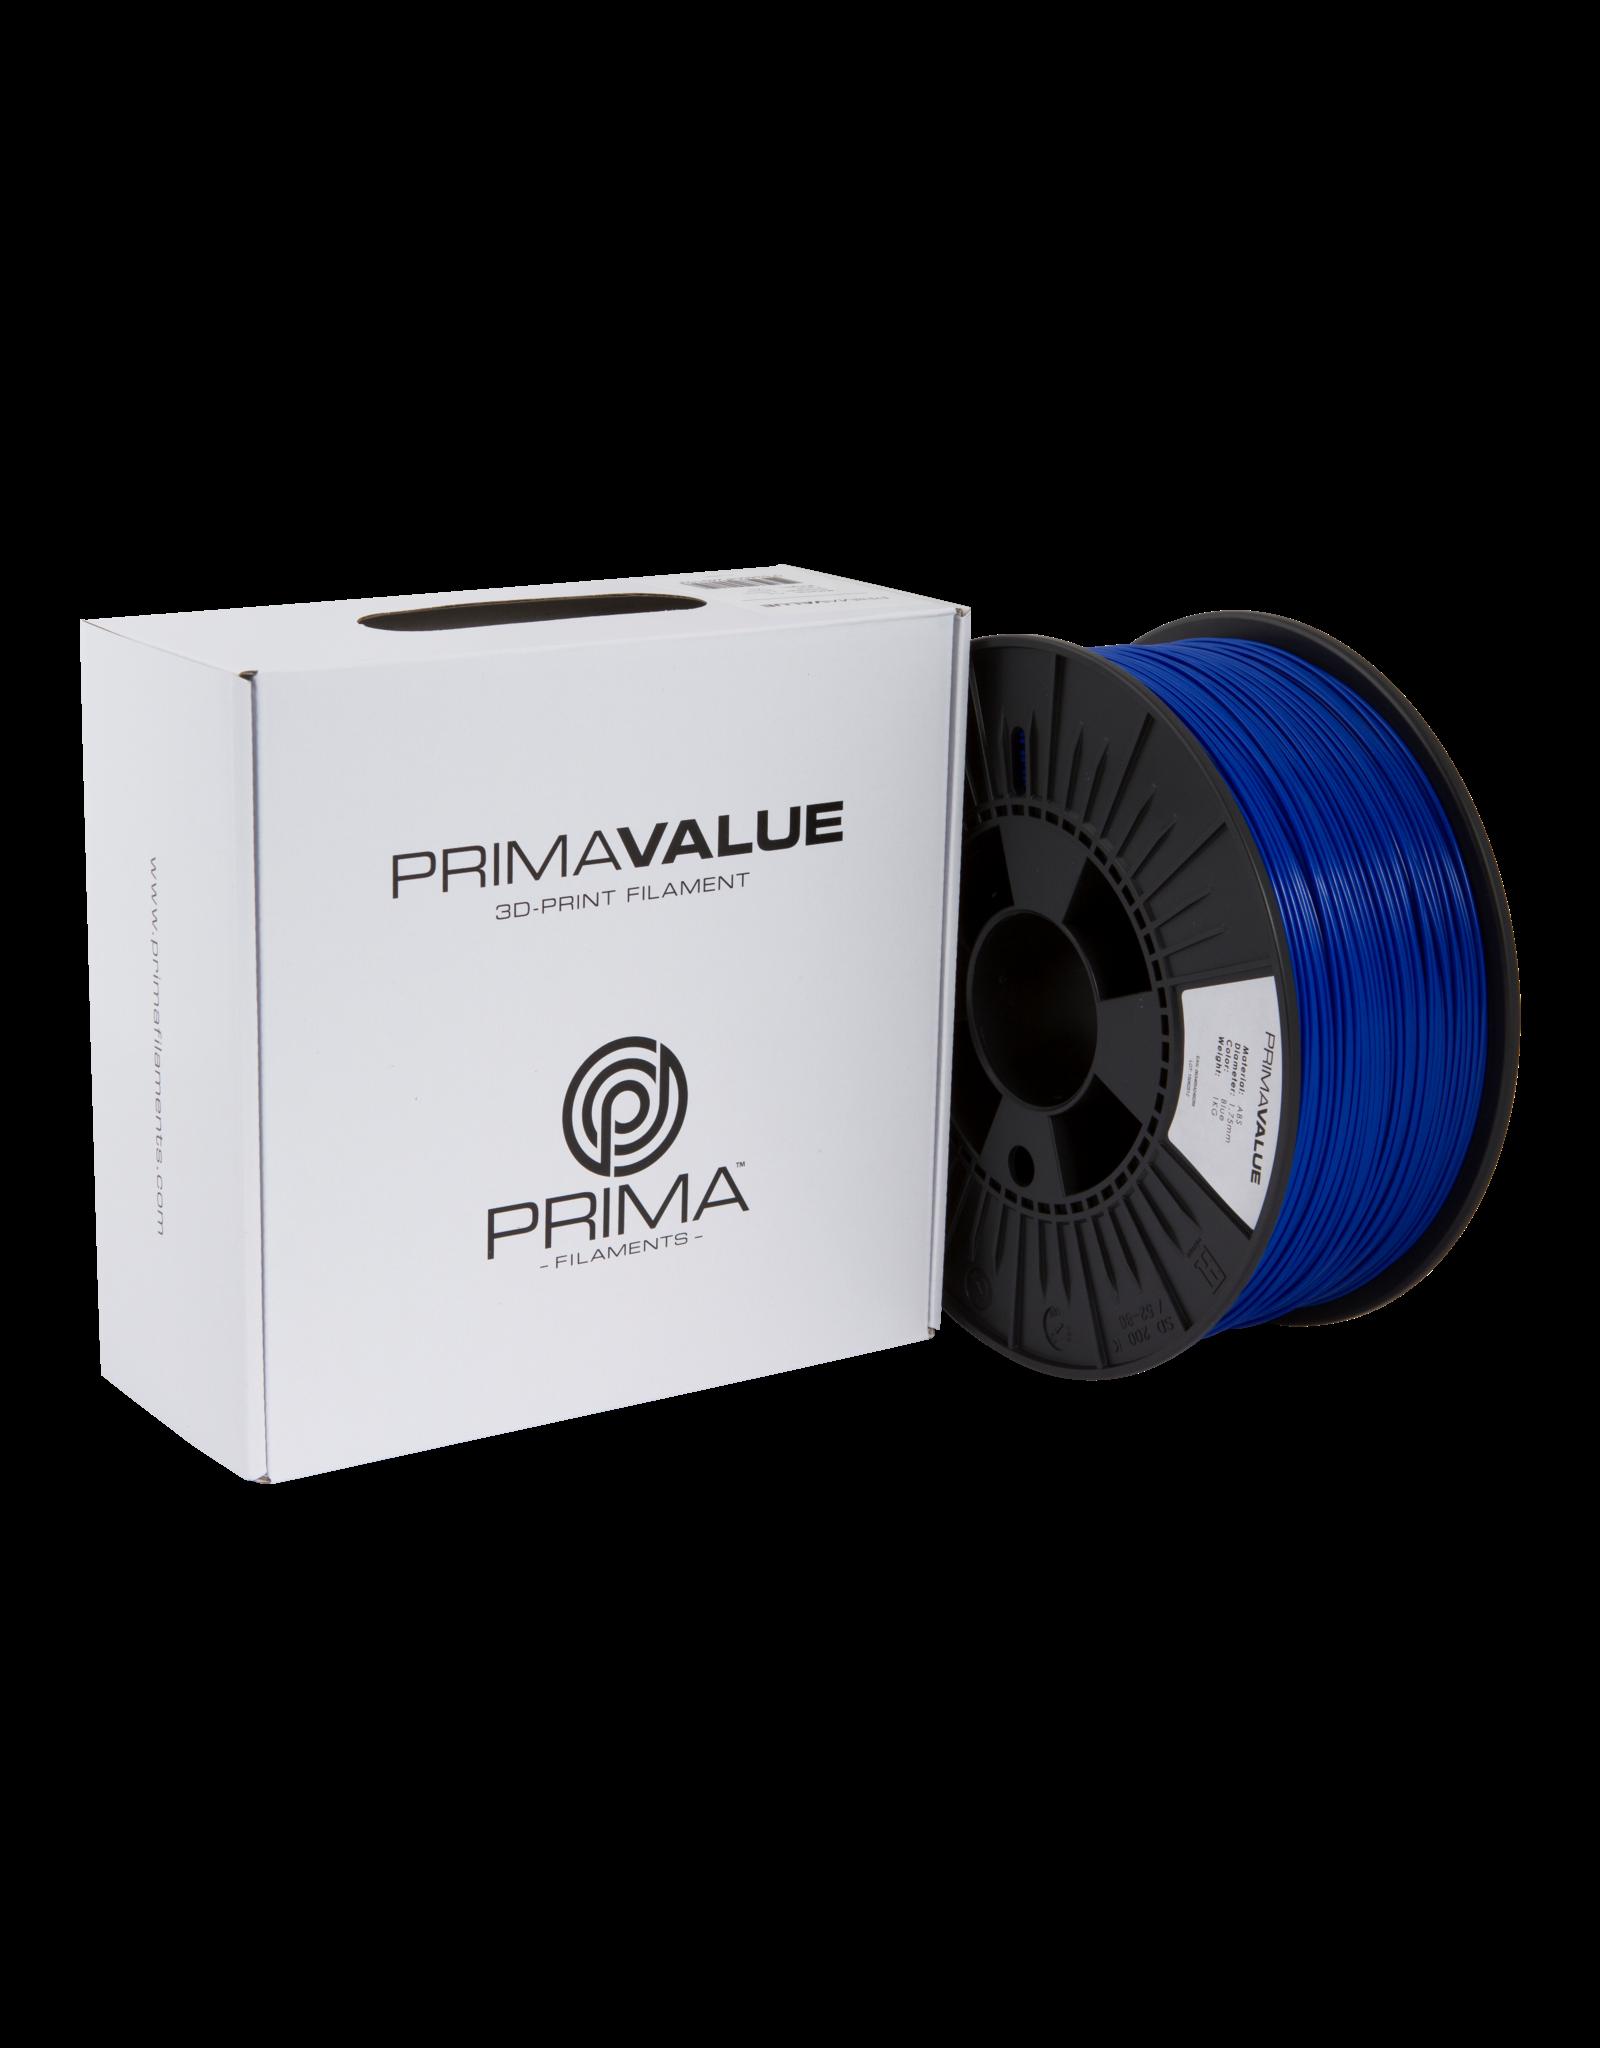 Prima PrimaValue ABS Filament - 1.75mm - 1 kg - Blue